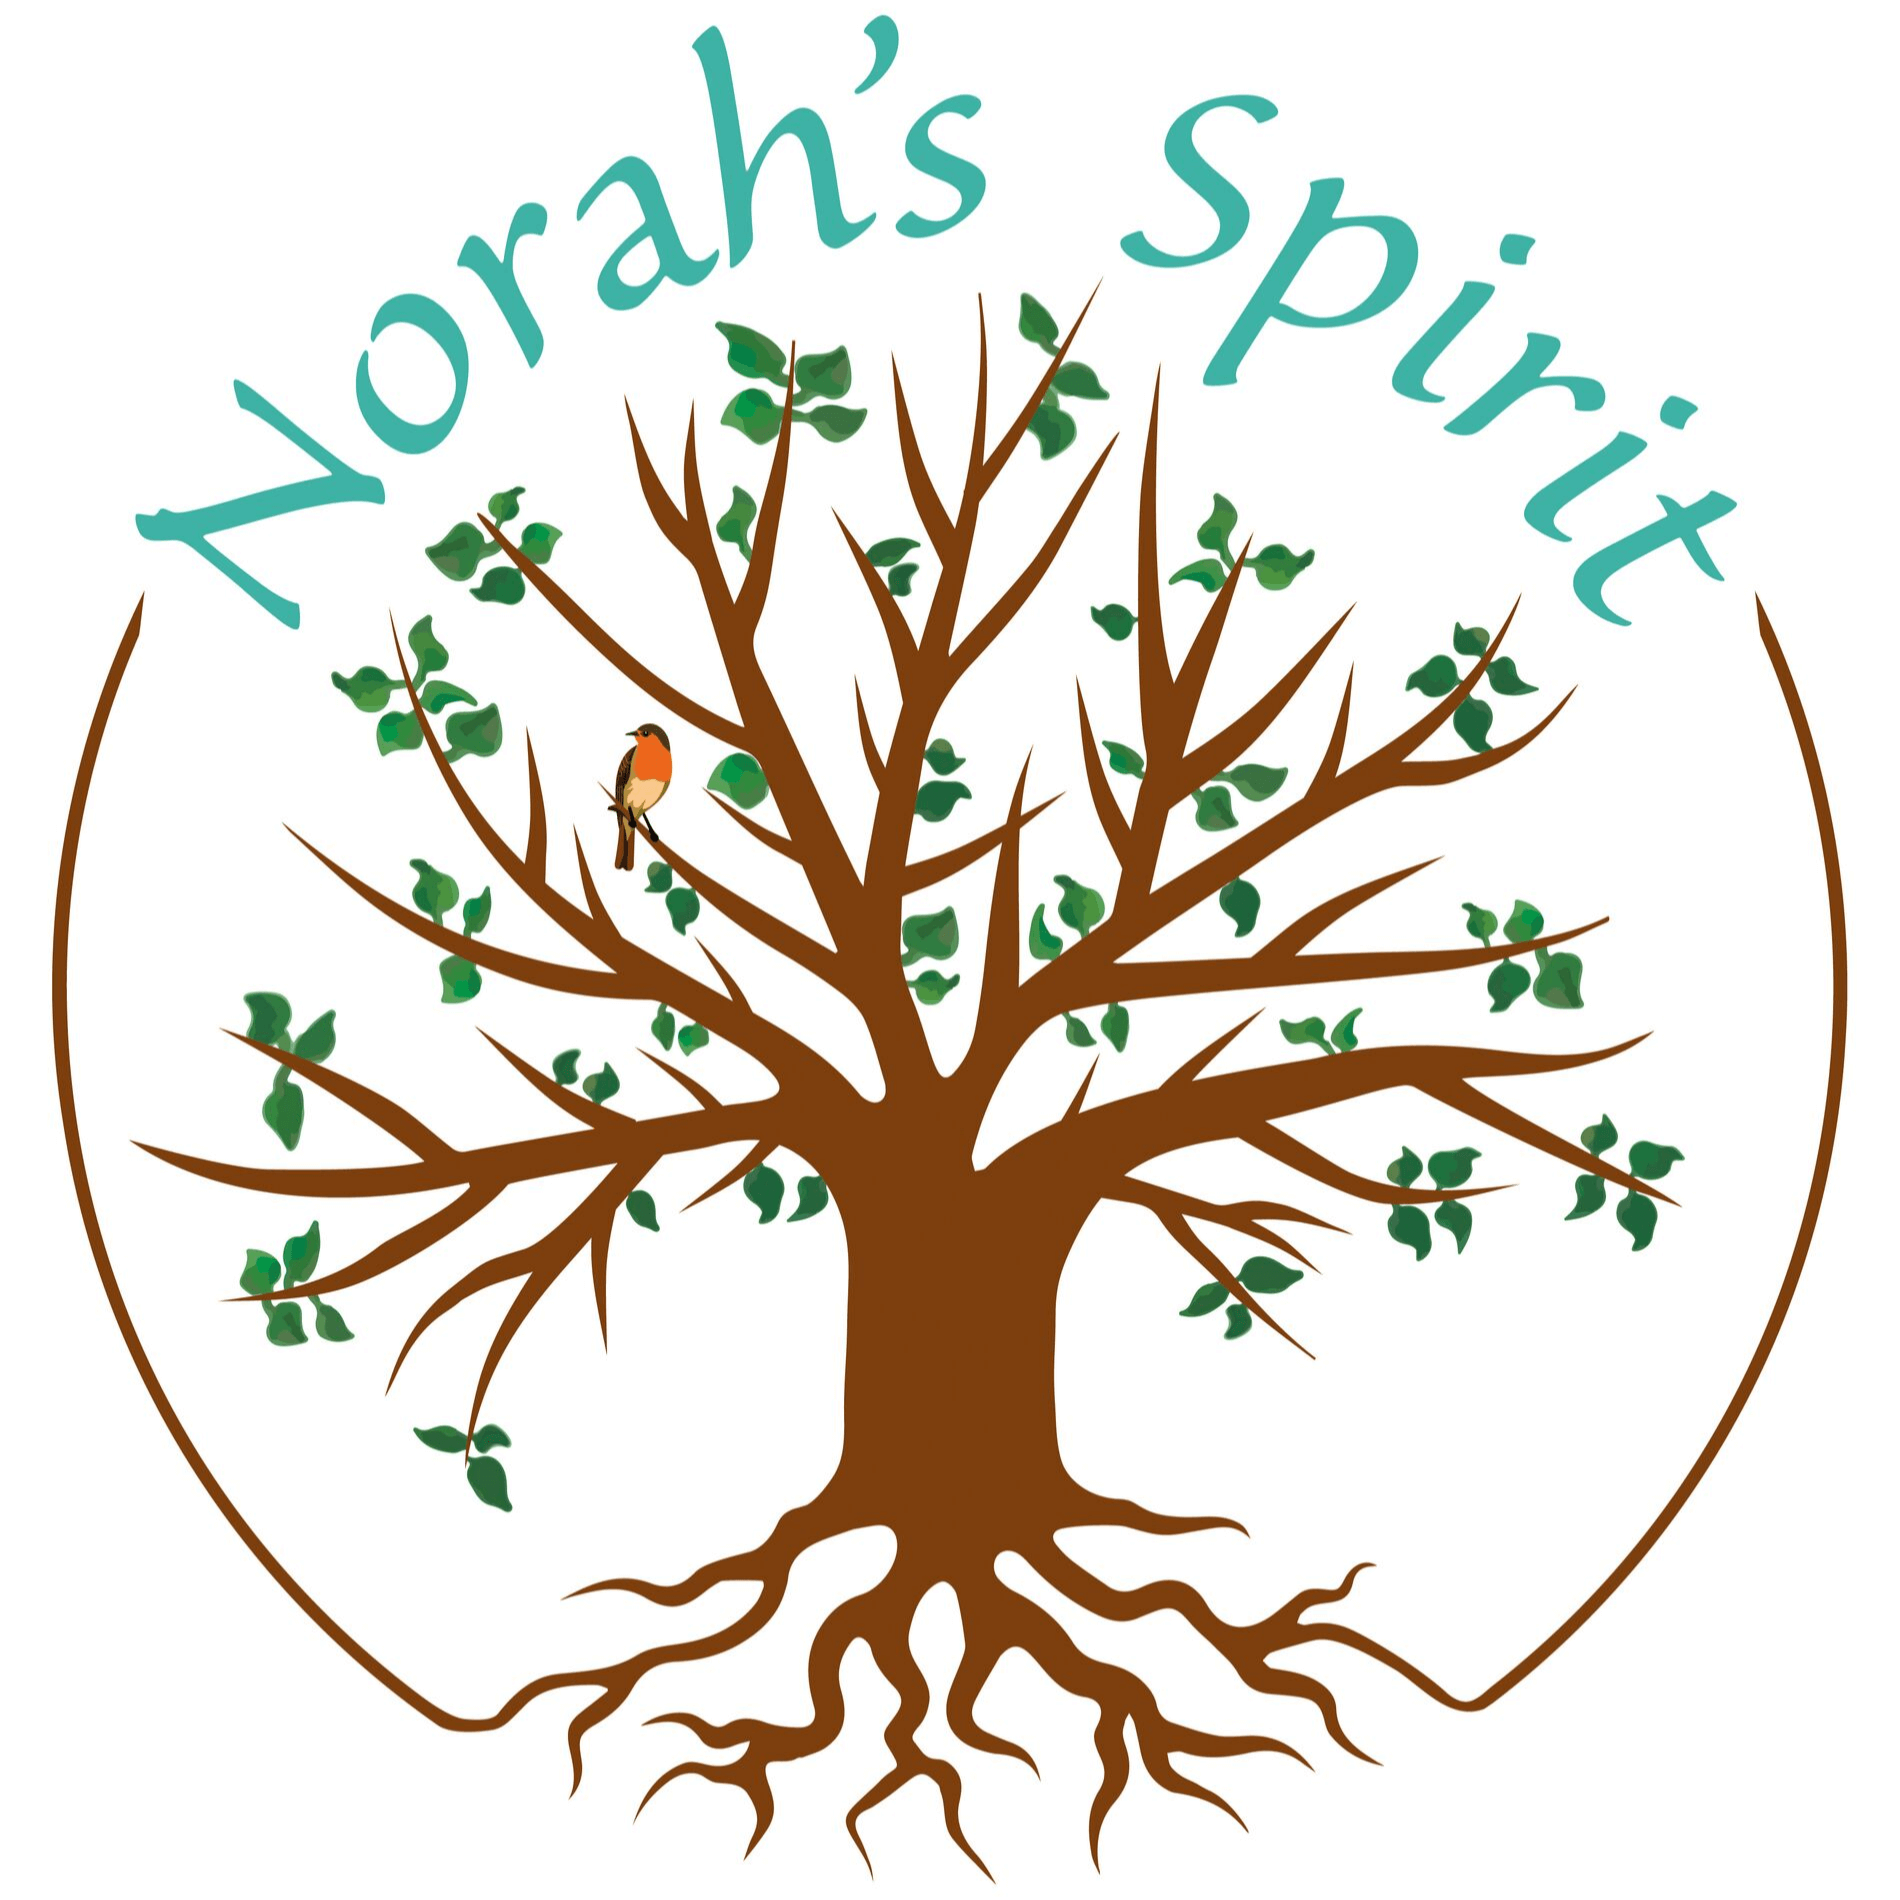 Norah's Spirit